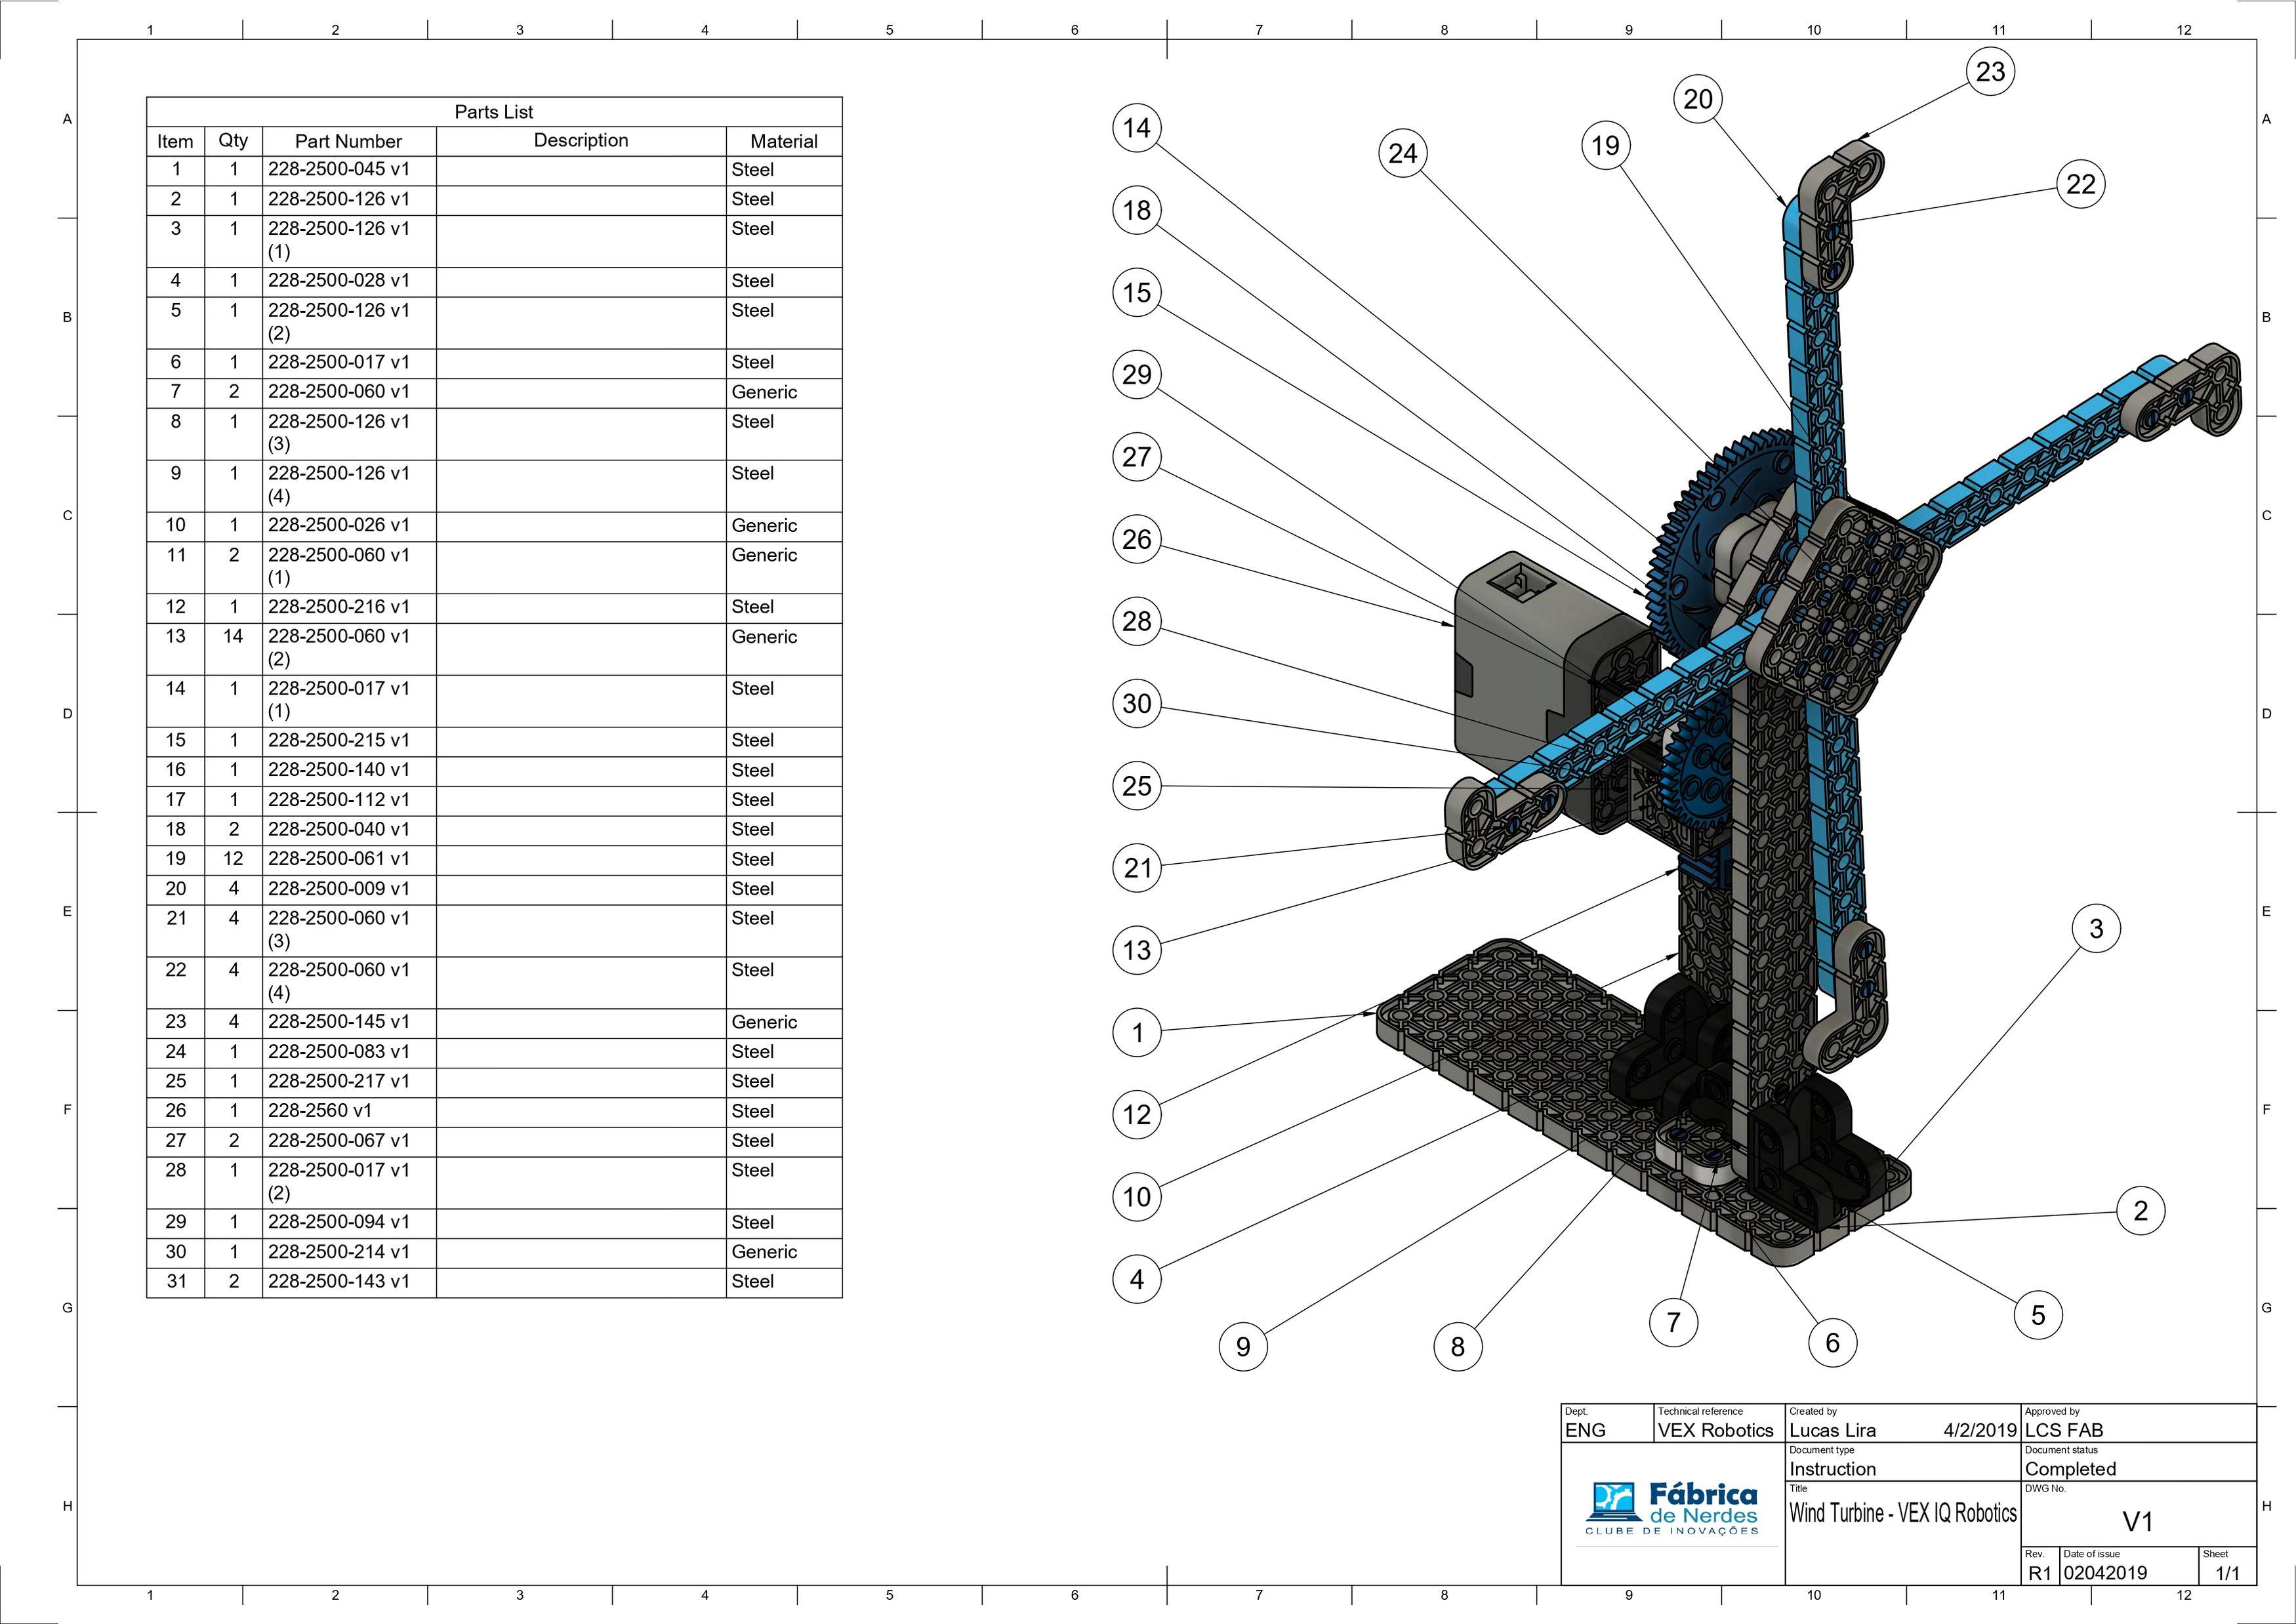 Wind-turbine---vex-iq-robotics-by-fabrica-de-nerdes--manual-page-0001-3500-3500